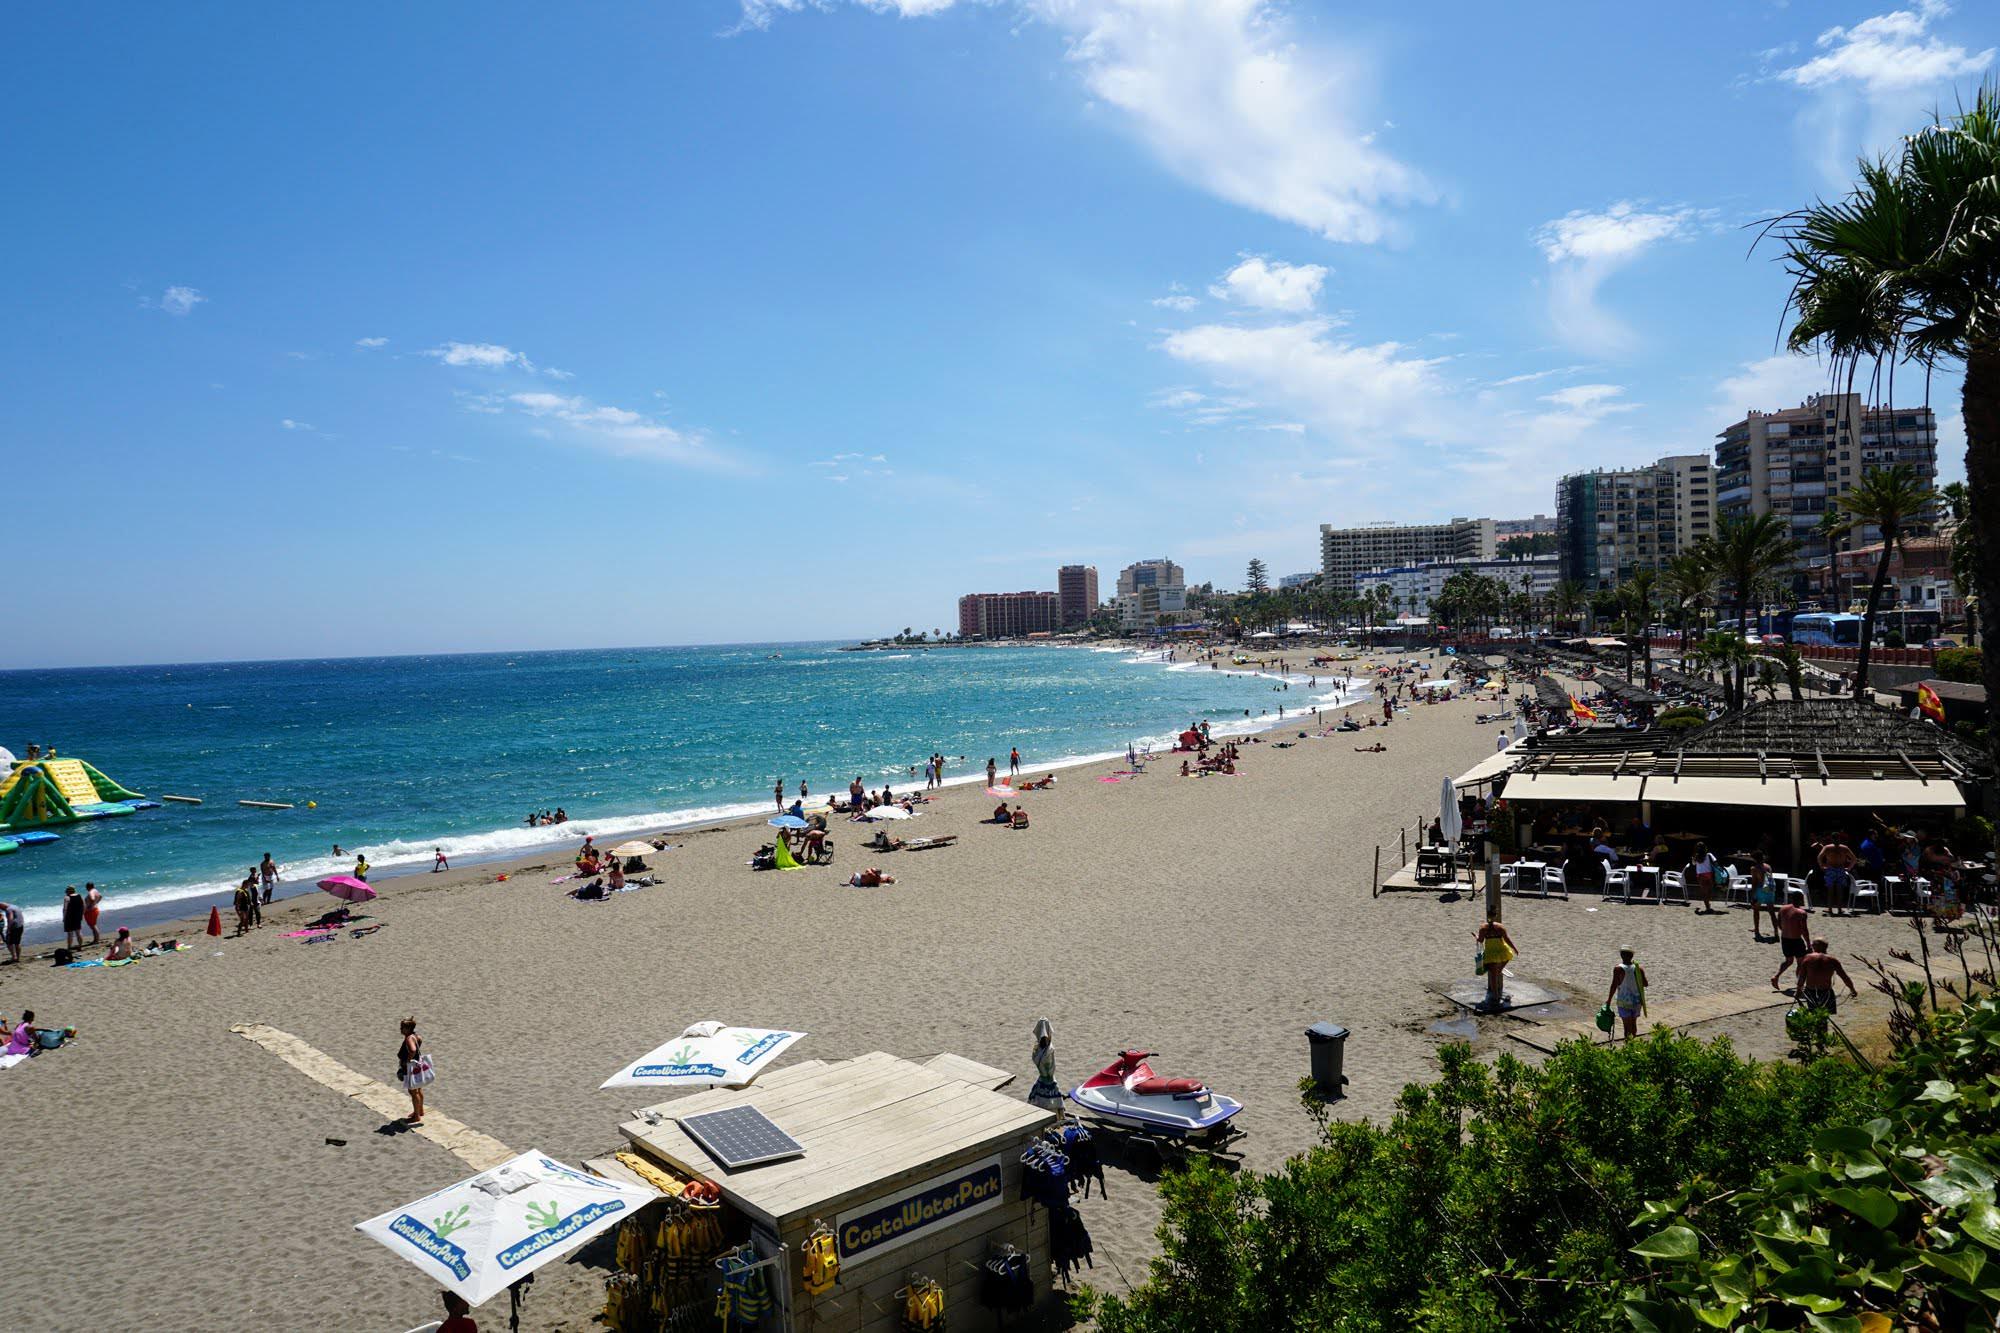 Strand Arroyo de la Miel